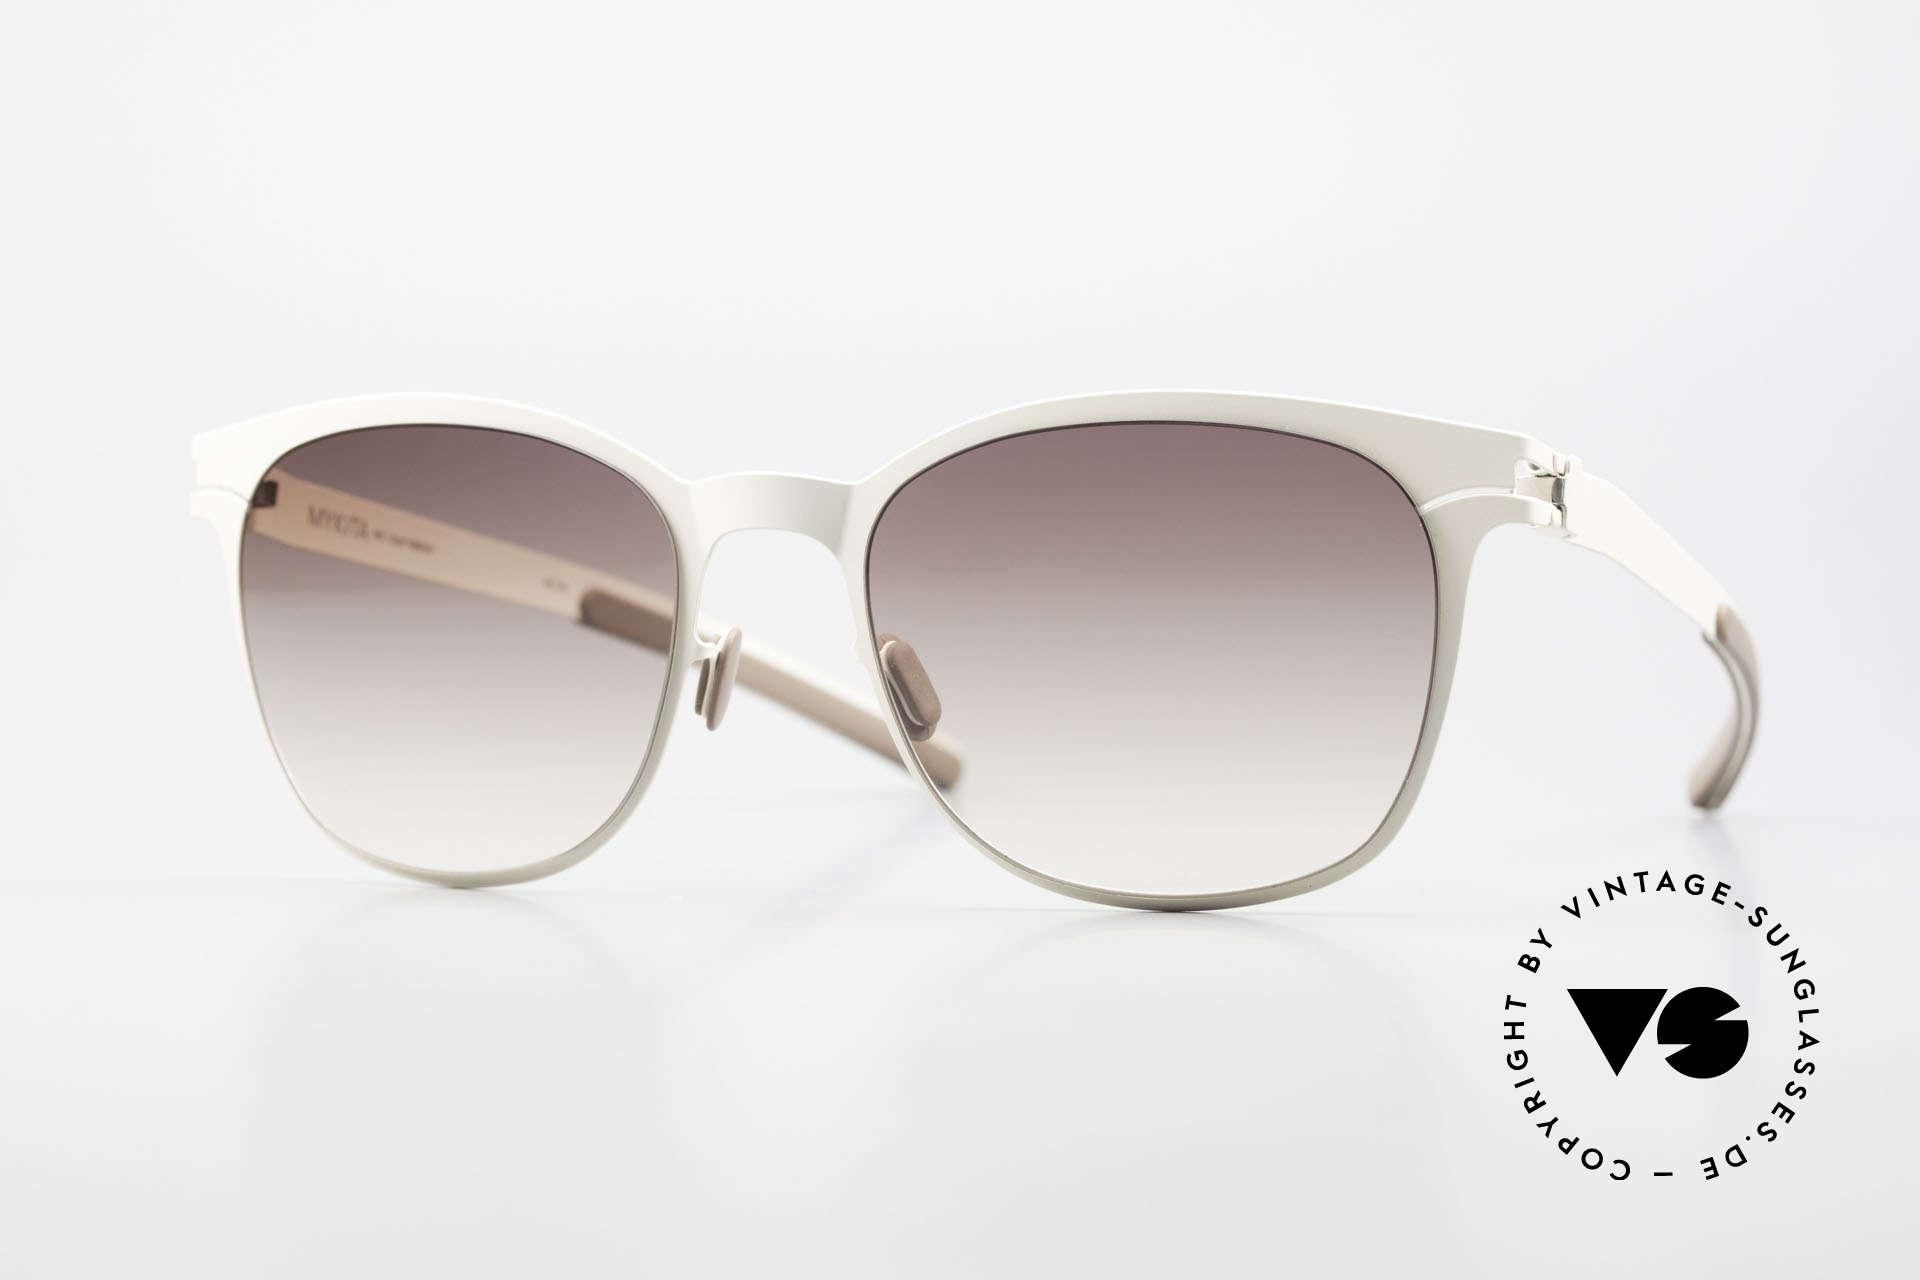 Mykita Greta Ladies Sunglasses From 2009, Collection No.1 Greta Offwhite, brown-gradient, 54/20, Made for Women